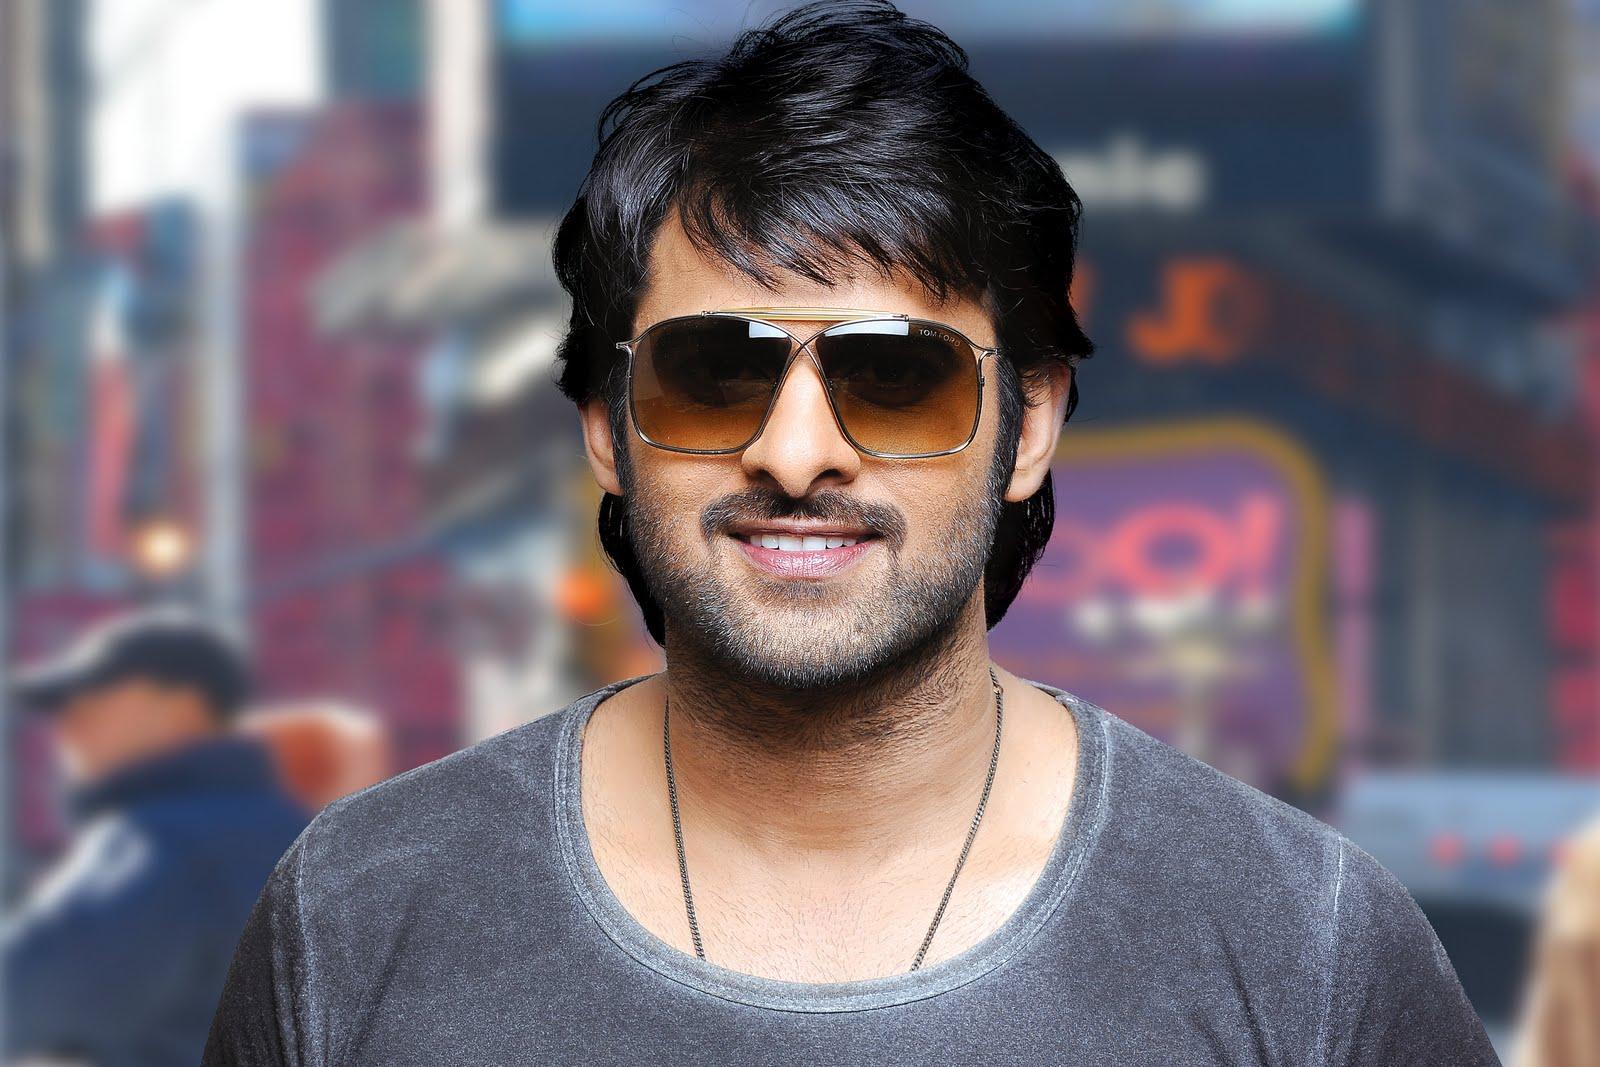 Prabhas Hd Wallpapers Download Telugu Actor Prabhas: 50+ Prabhas Images, Photos, Pics & HD Wallpapers Download